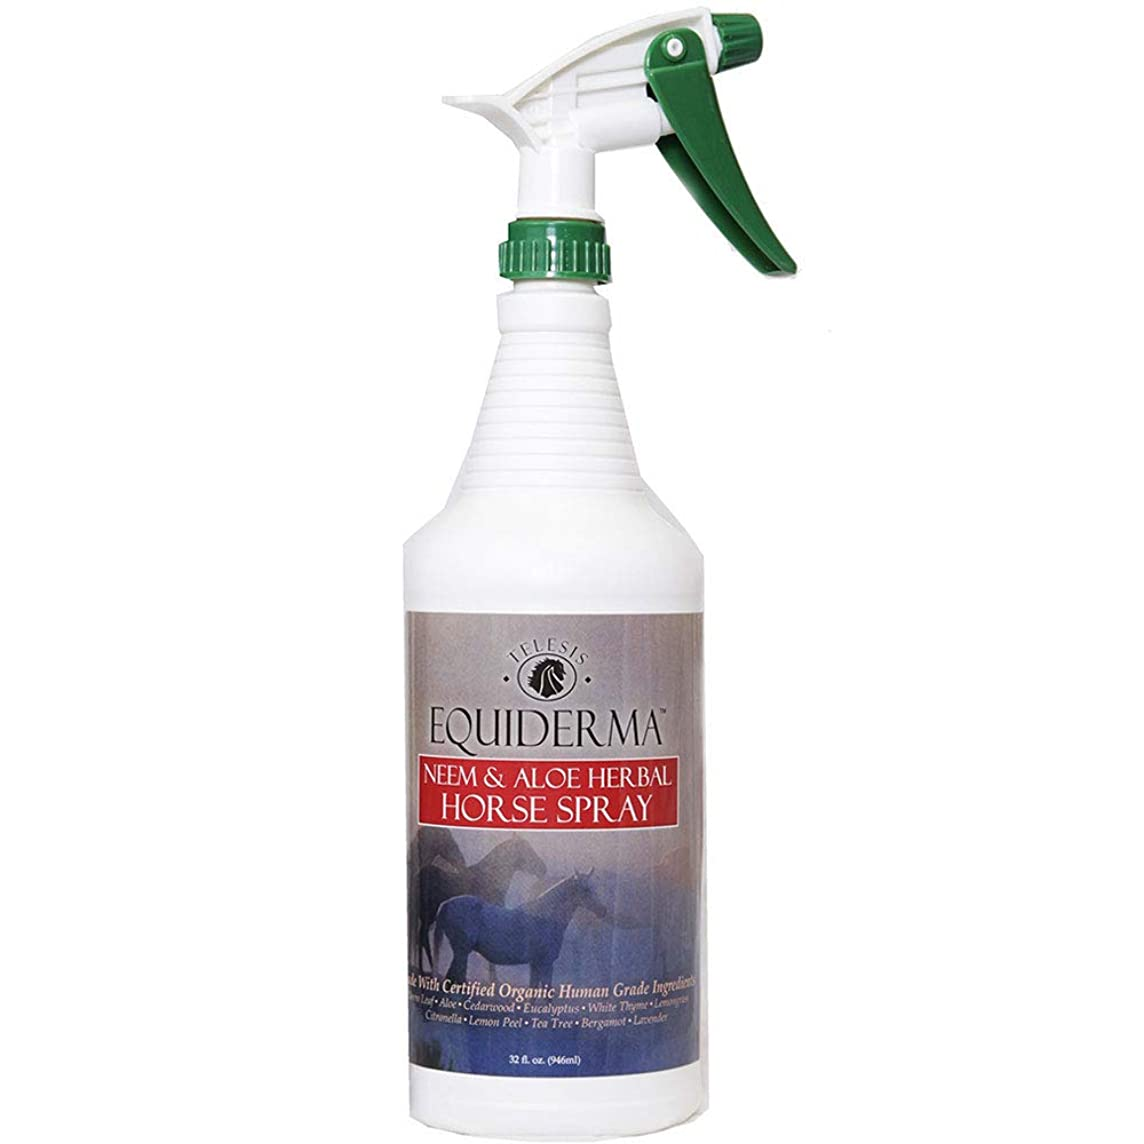 Equiderma Neem and Aloe Horse Spray, 32 Ounces Per Bottle